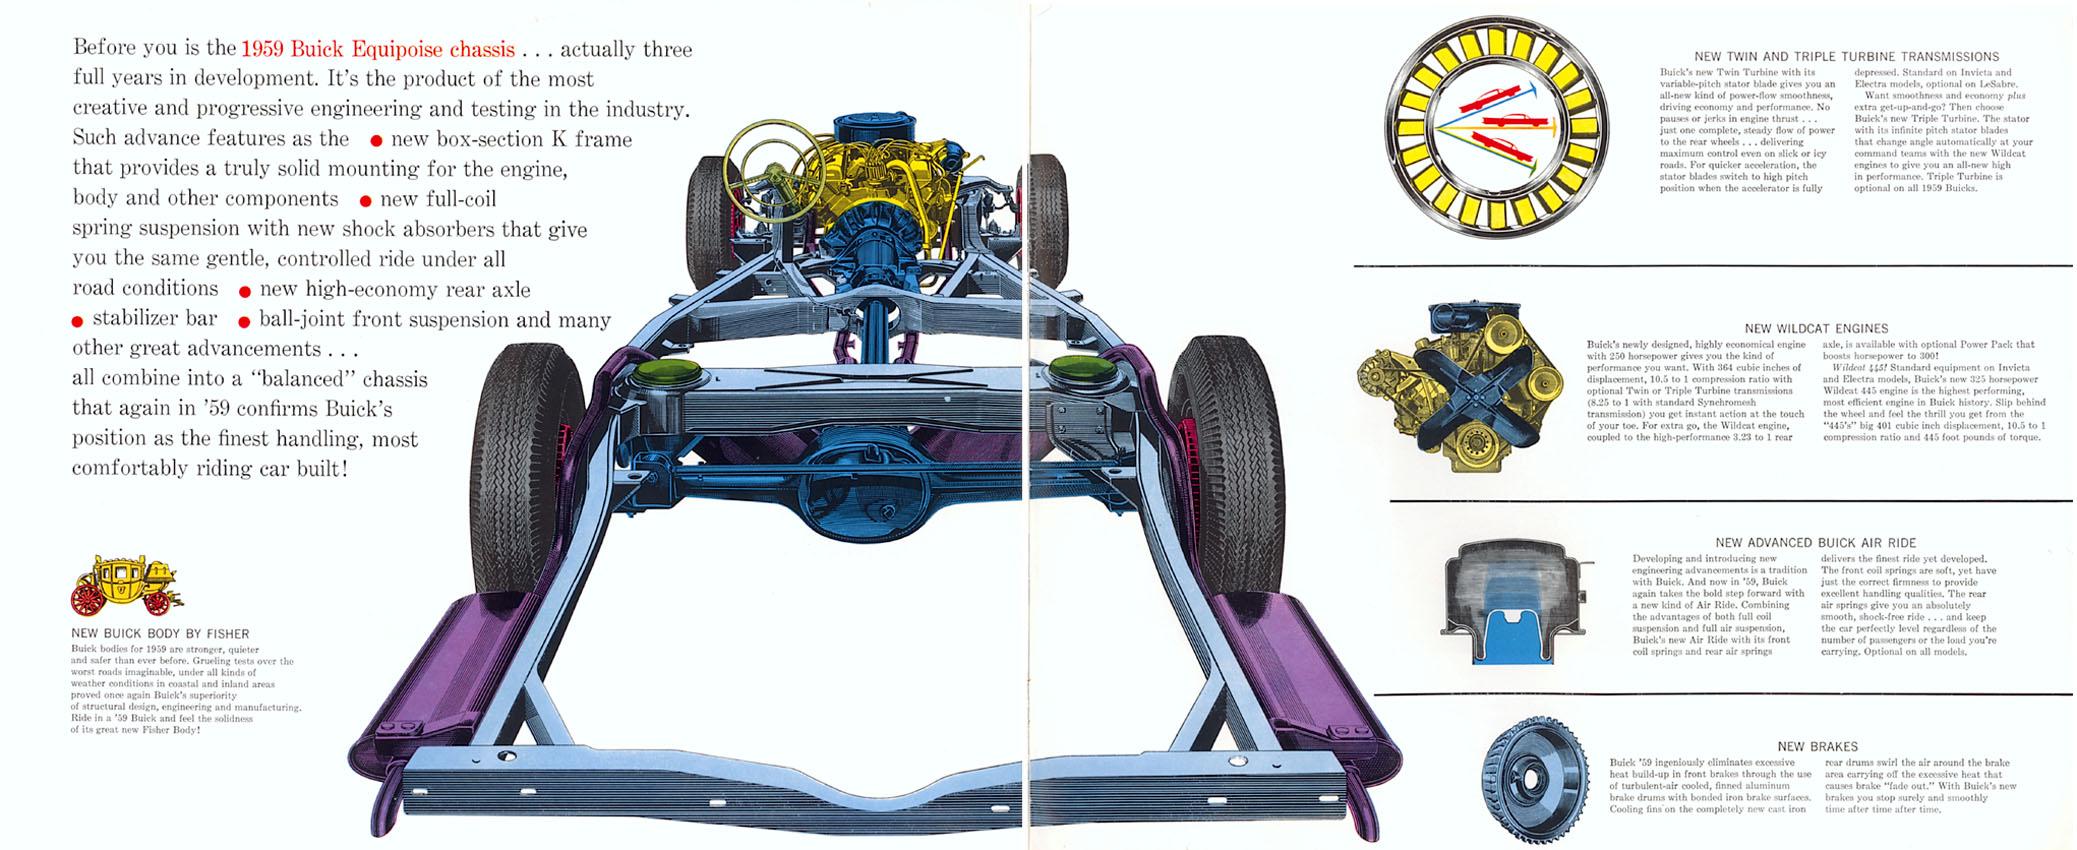 Luxury K Frame On A Car Gift - Framed Art Ideas - roadofriches.com